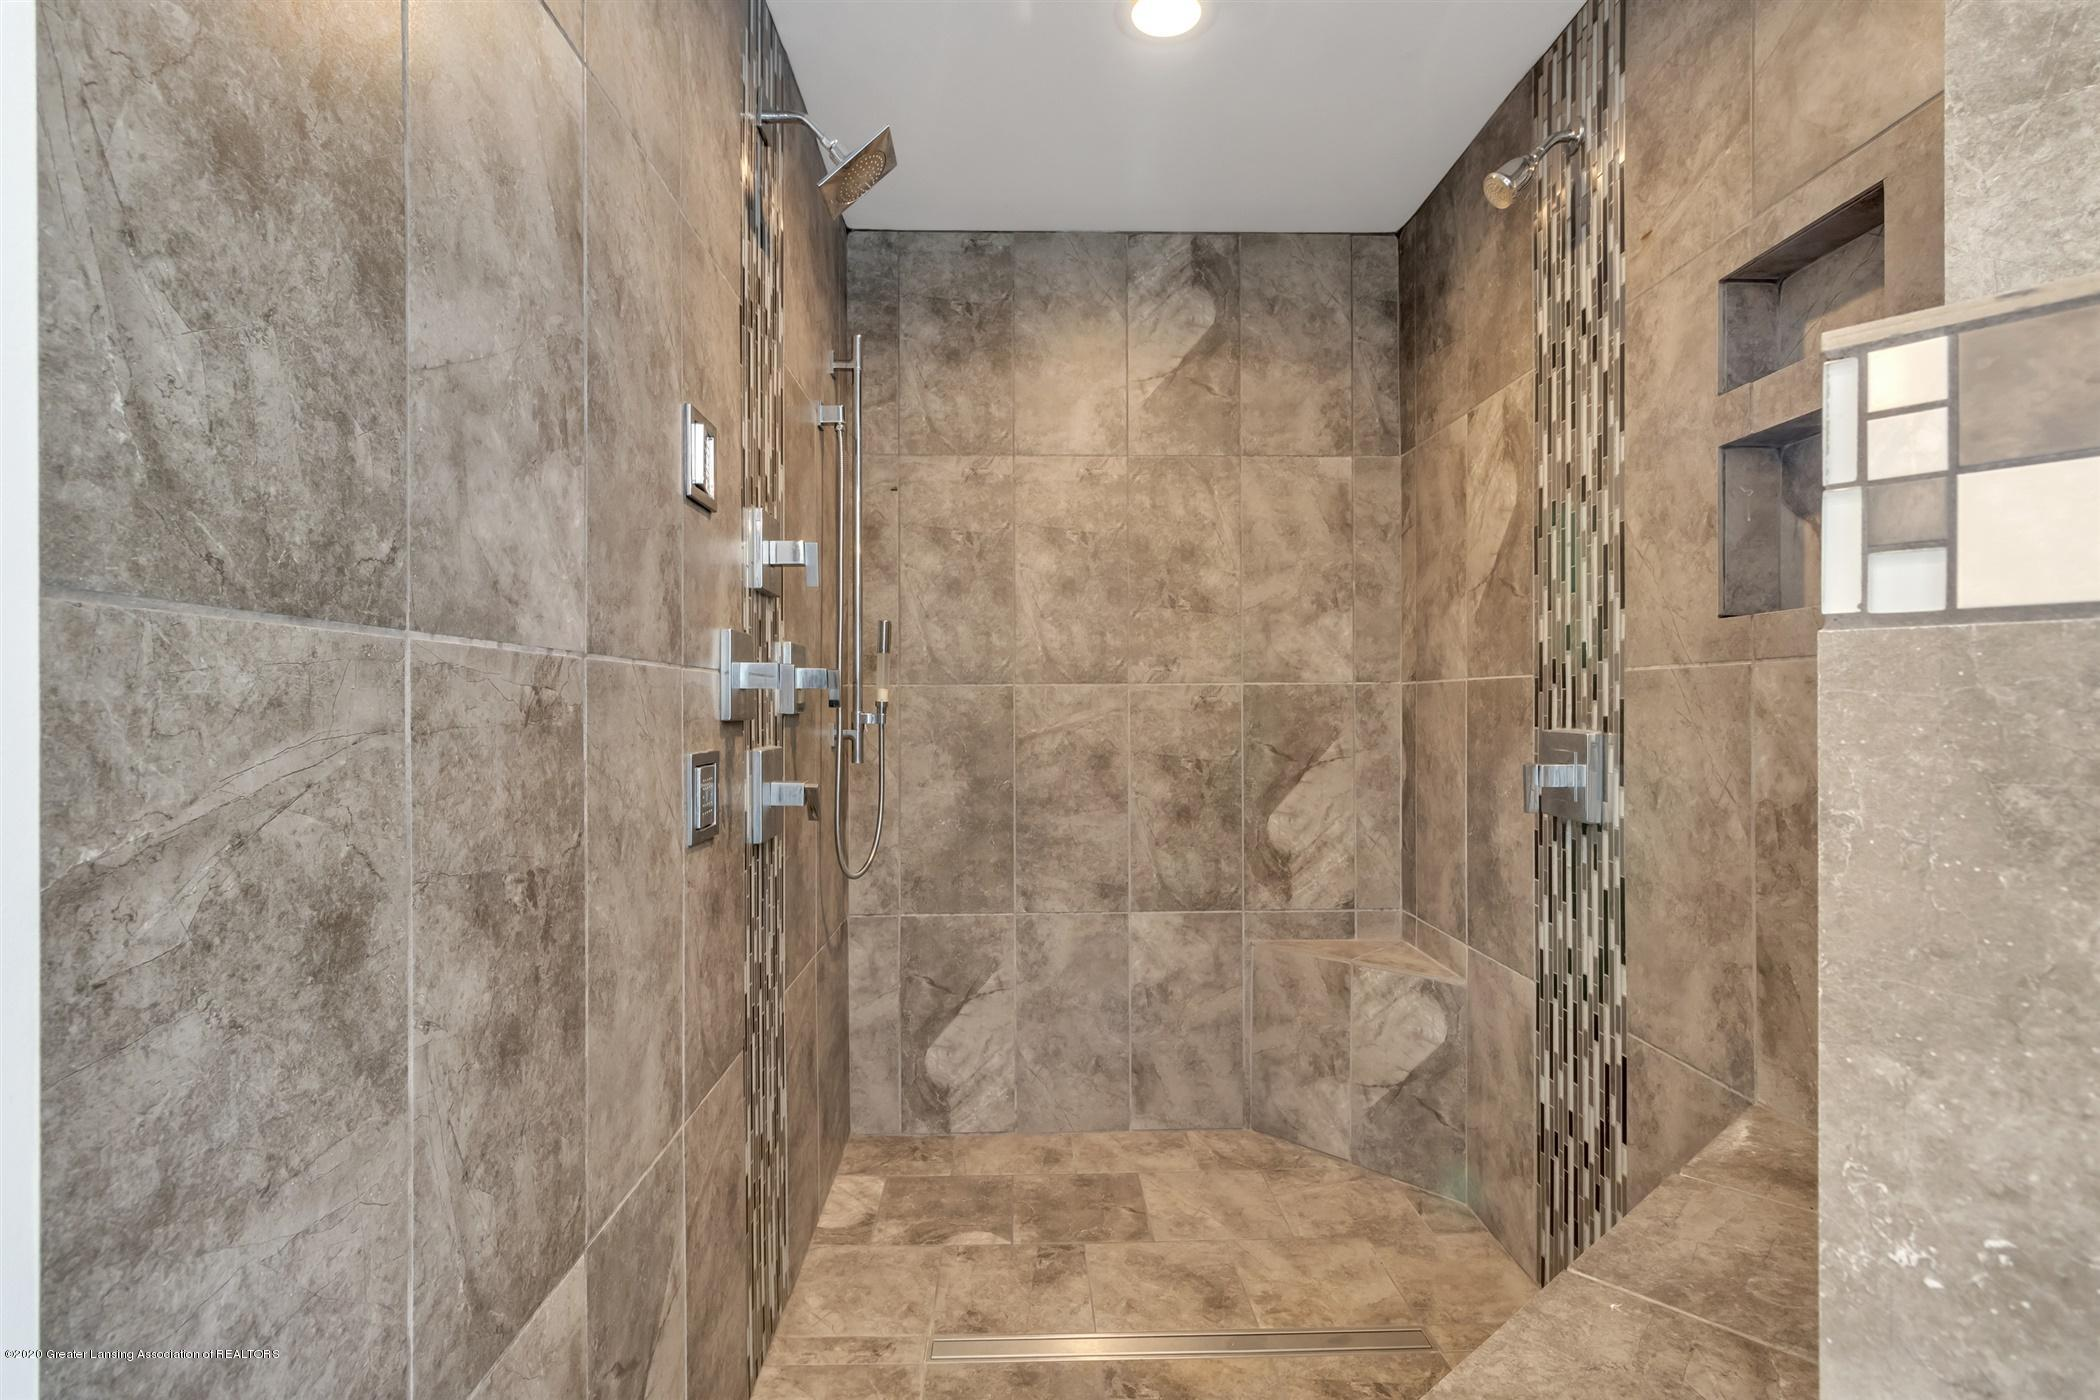 7346 W Cutler Rd - 2ND BATHROOM SHOWER - 38